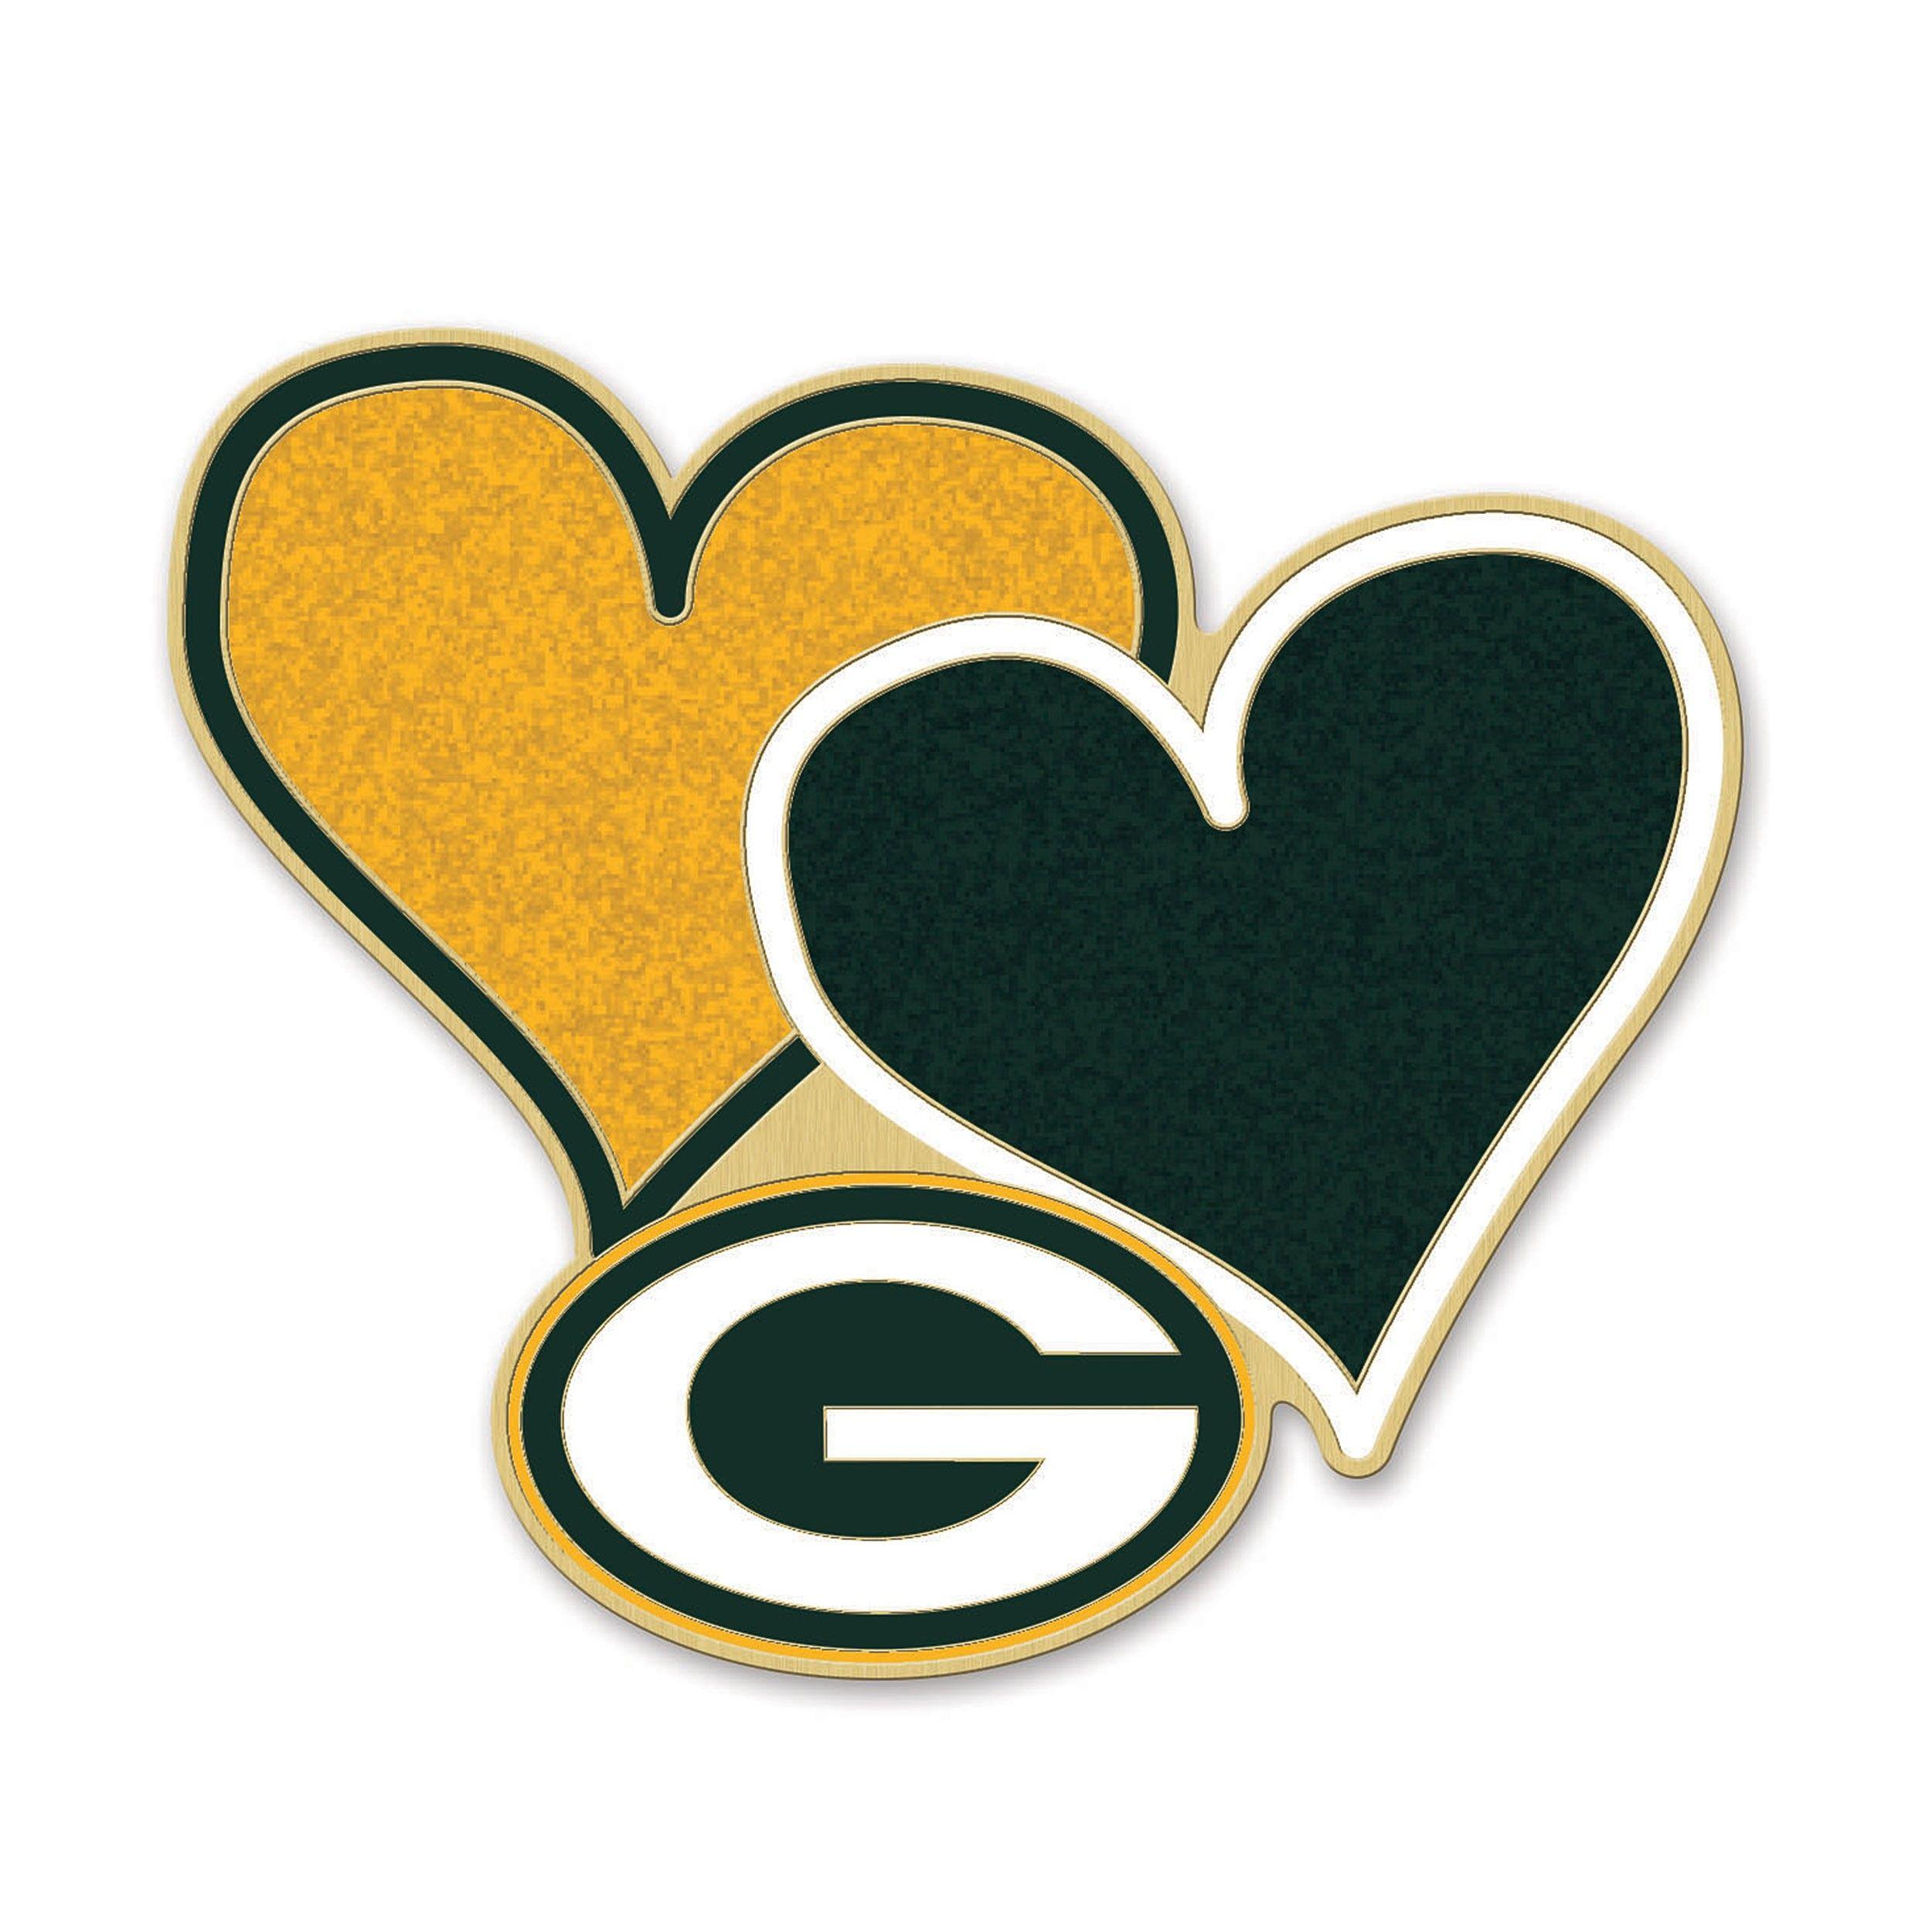 2206078196 37 13 2500 Jpg 2500 2500 Green Bay Packers Women Green Bay Packers Logo Green Bay Packers Wallpaper